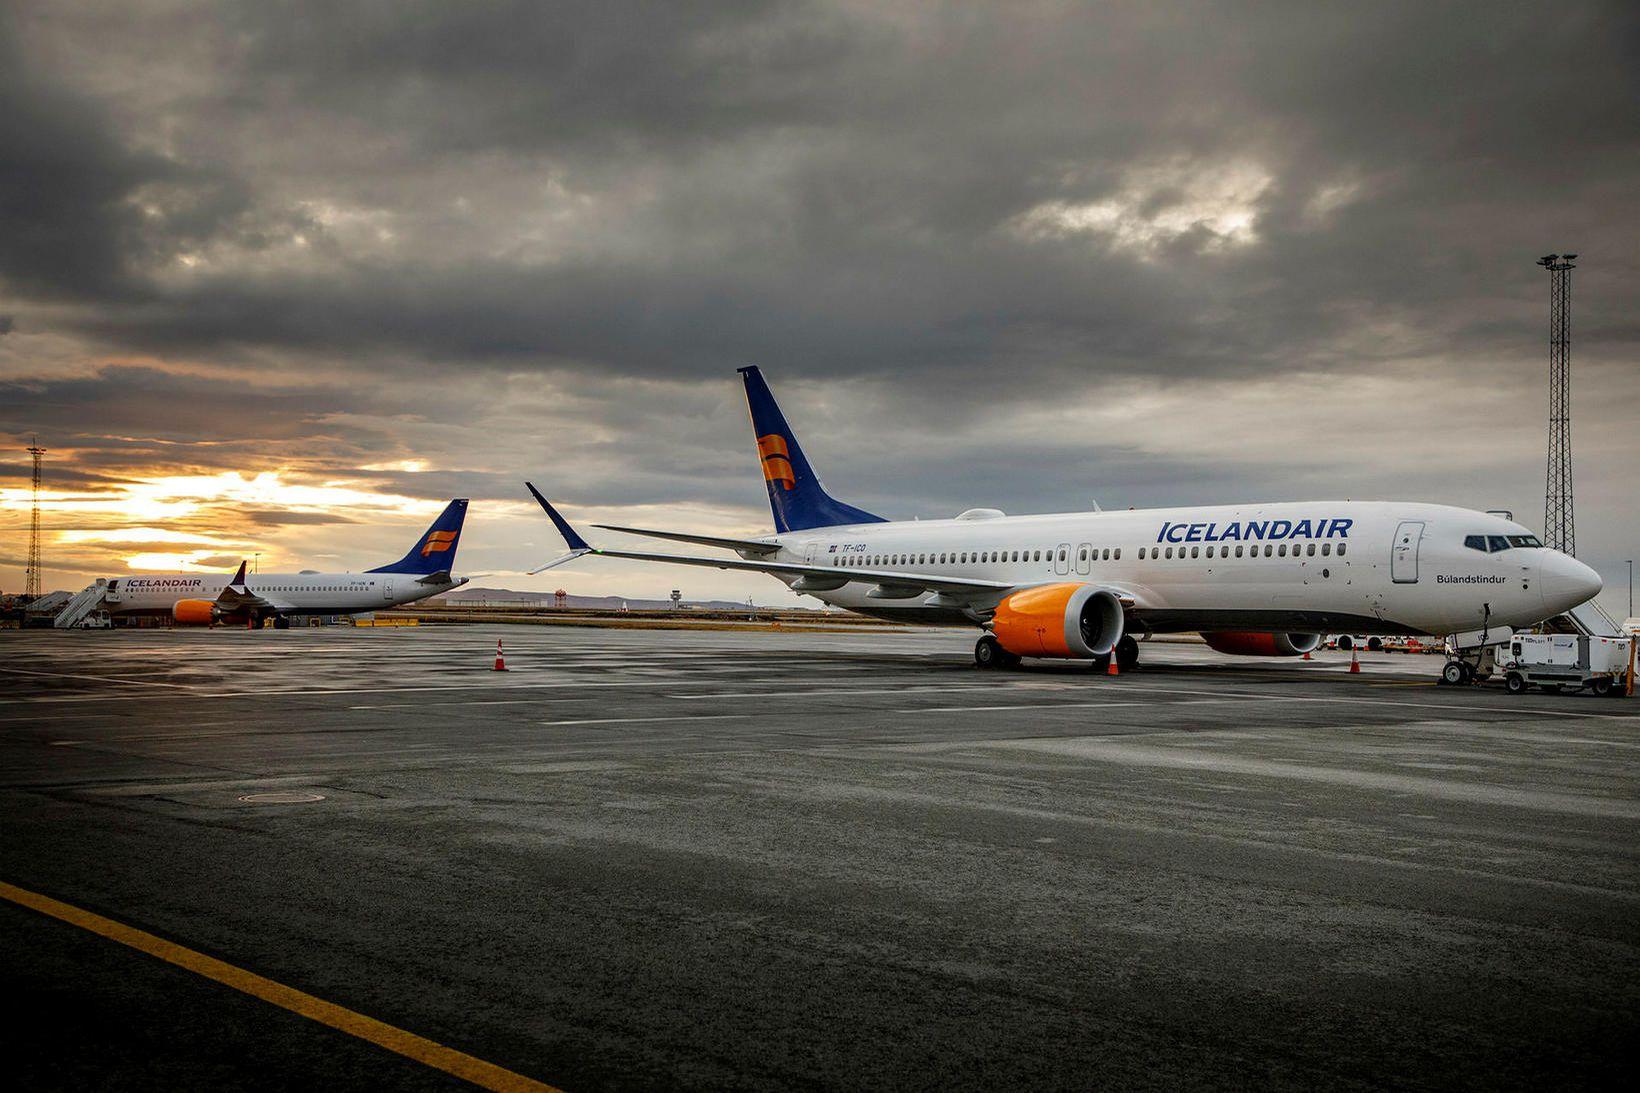 Boeing 737 Max vélarnar hafa verið kyrrsettar frá því í …